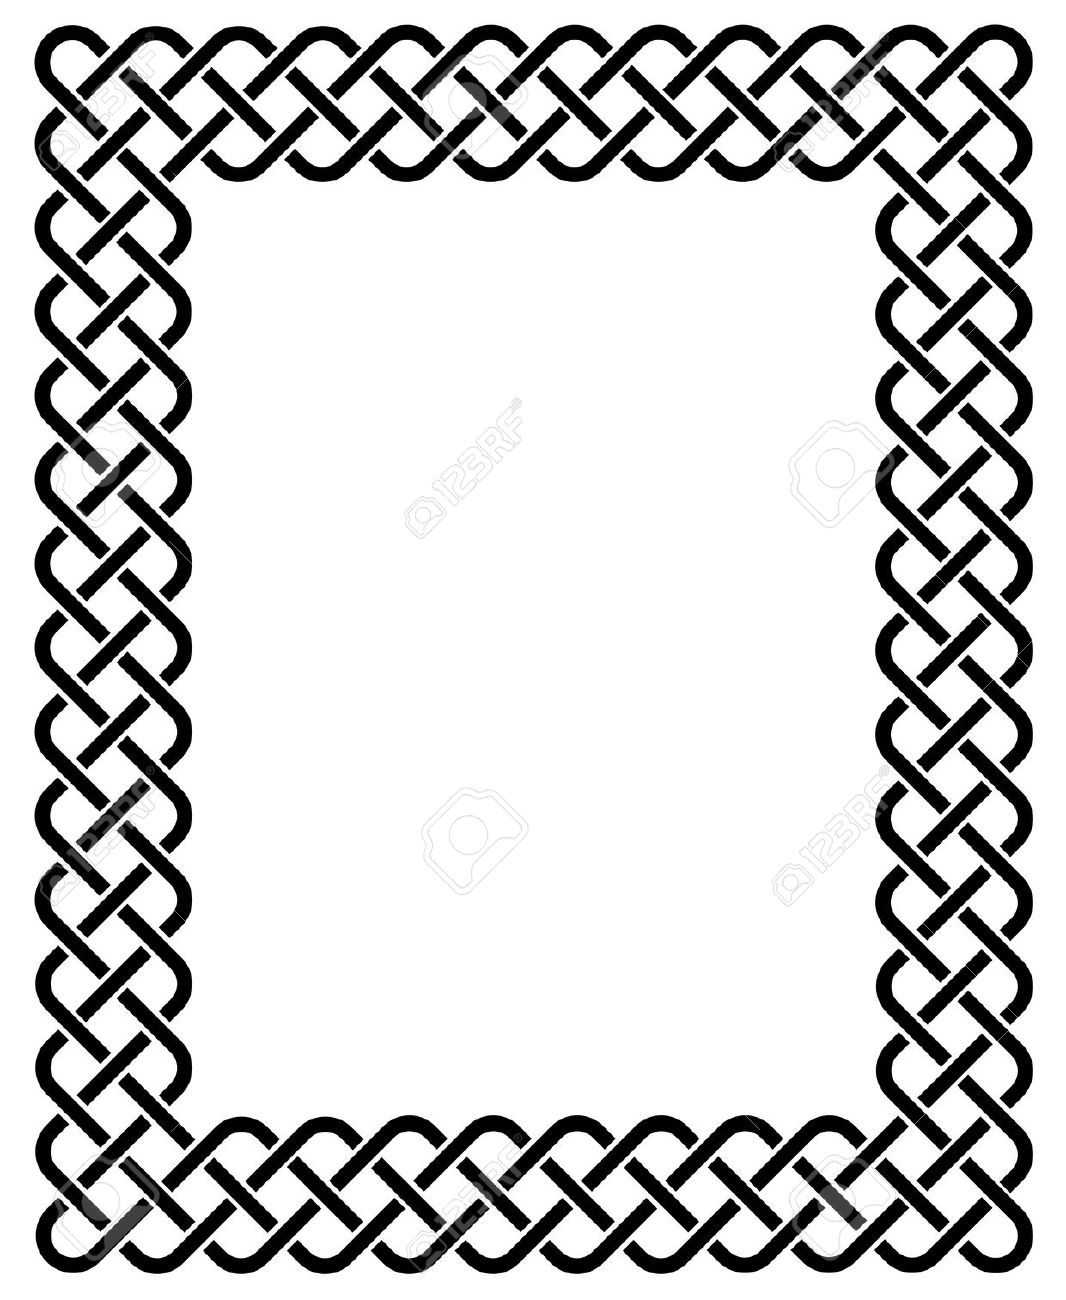 1066x1300 Celtic Knot Vector Border